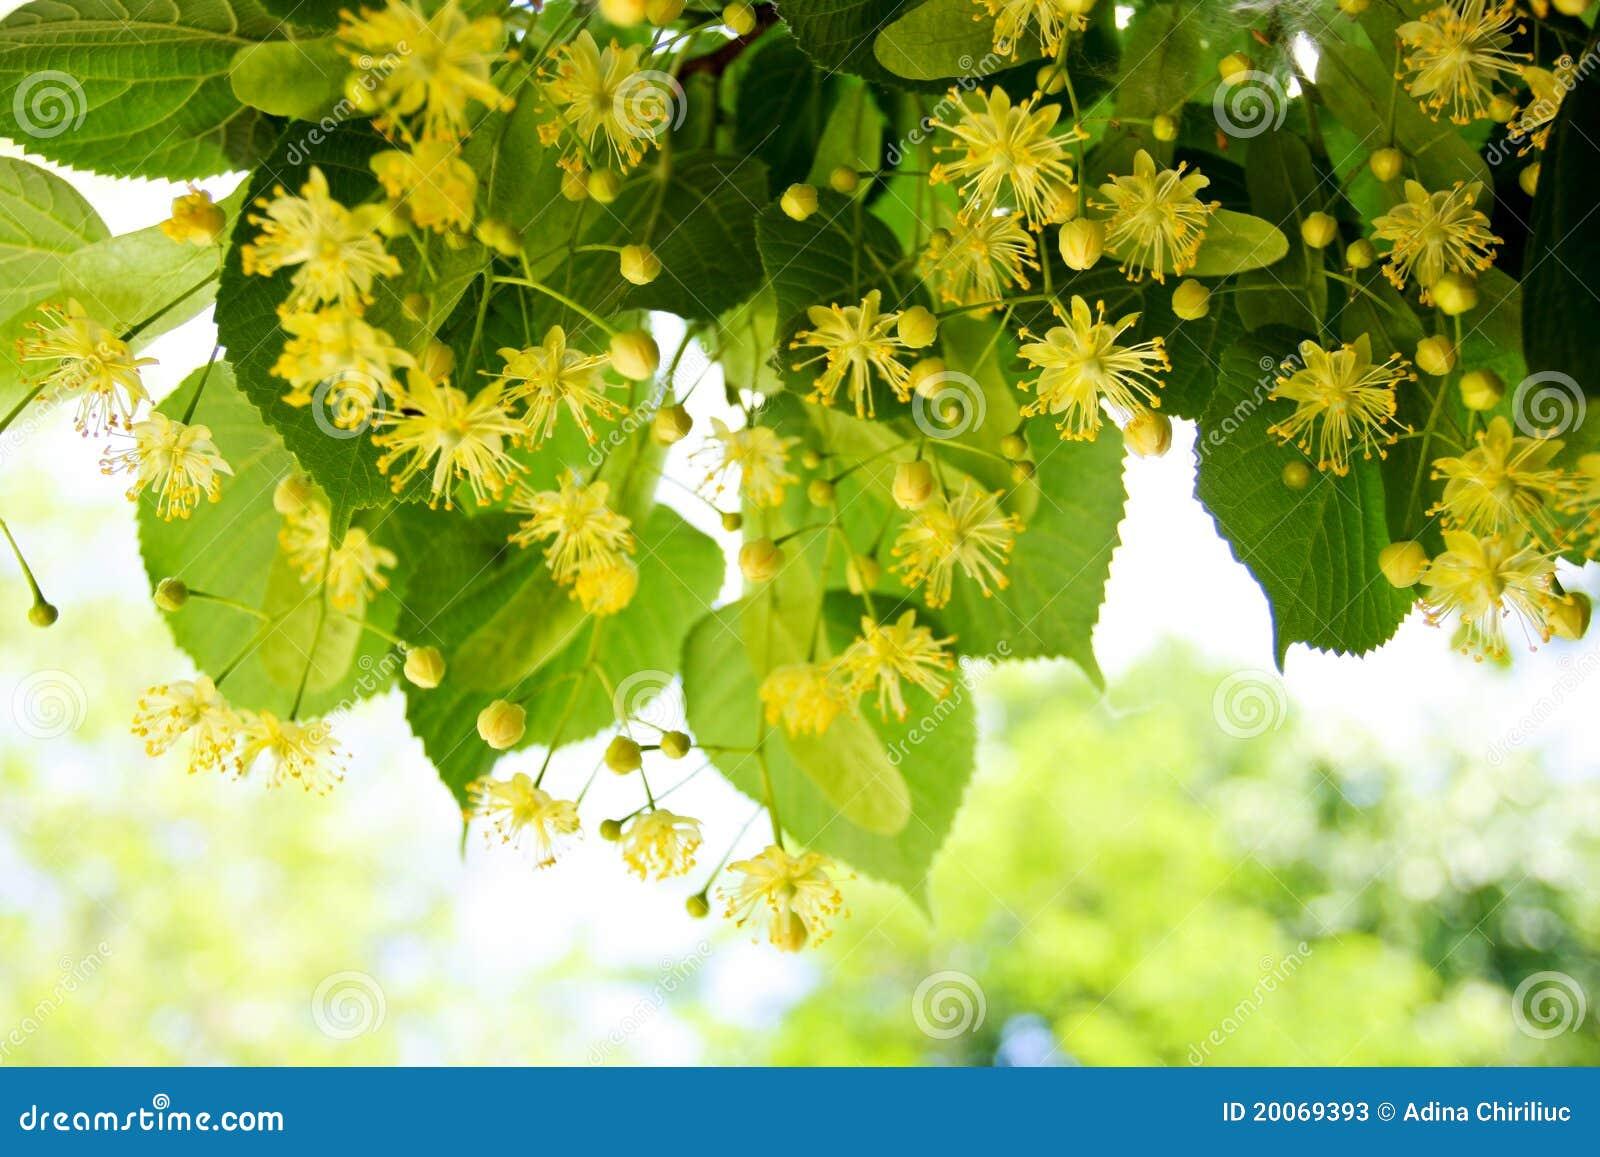 Linden Tree Flowers Stock s Image